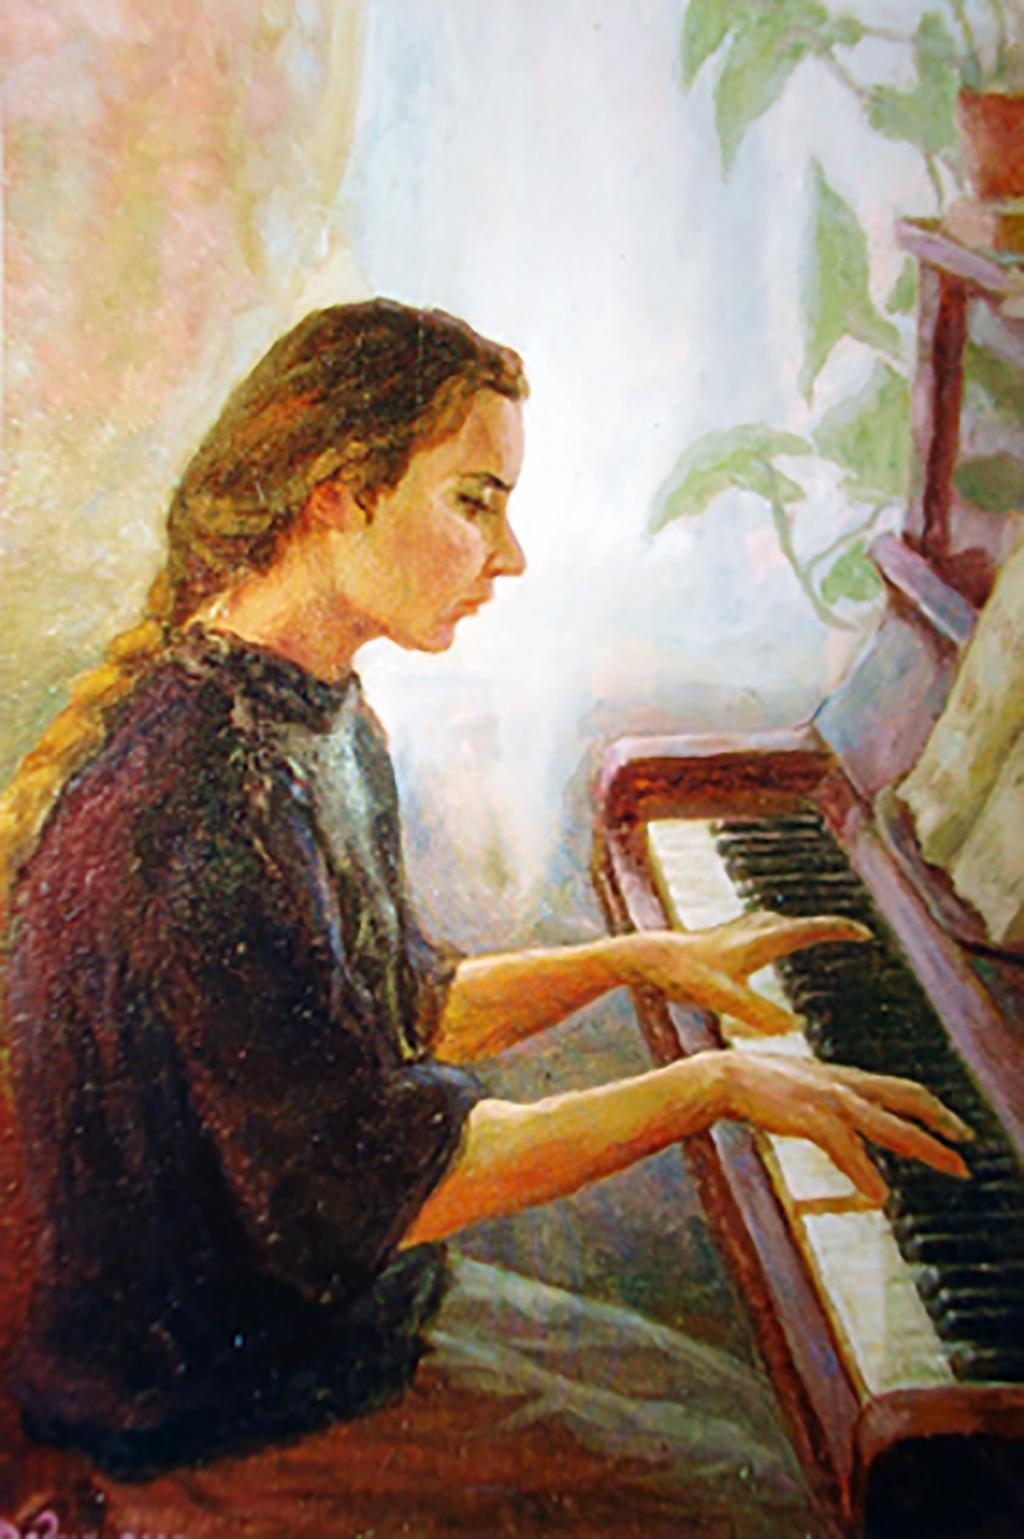 173-1 by yakovdedyk